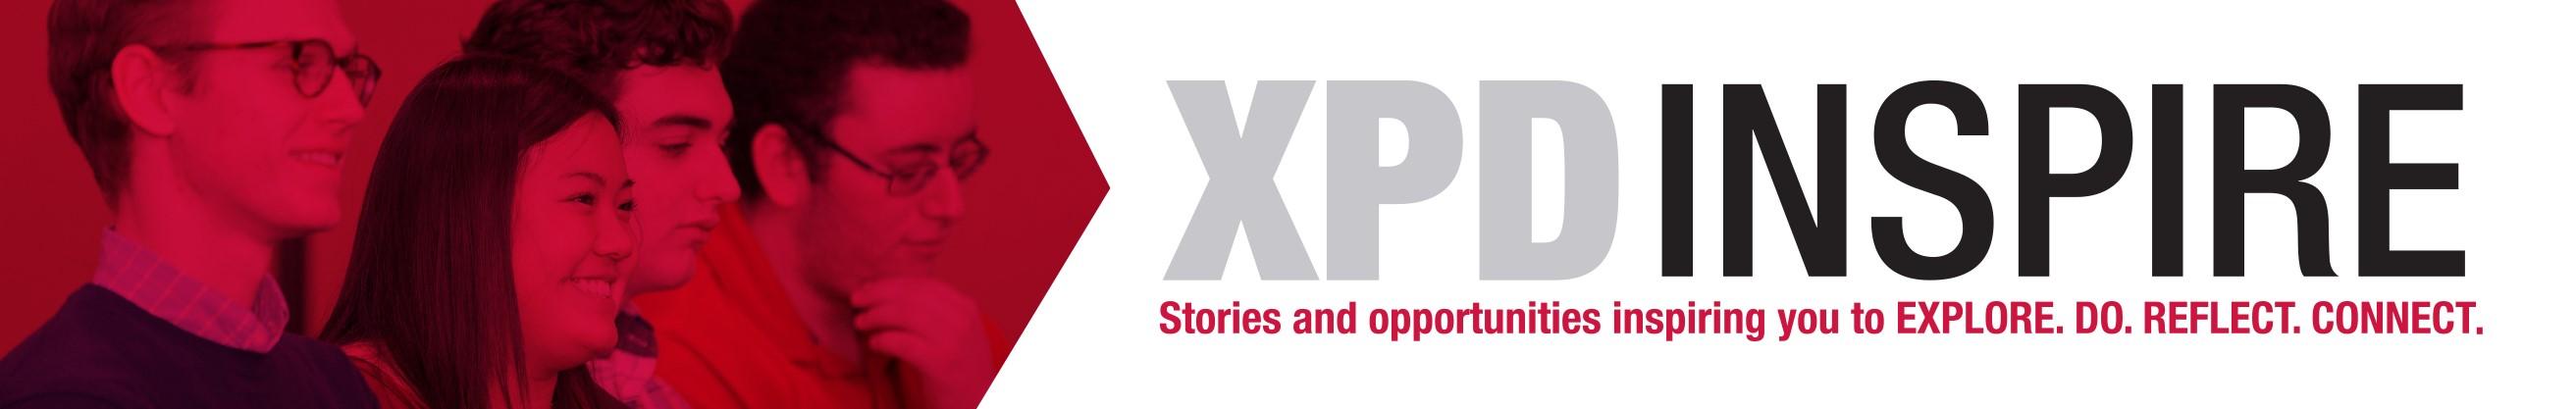 XPDInspire header 9.18 4